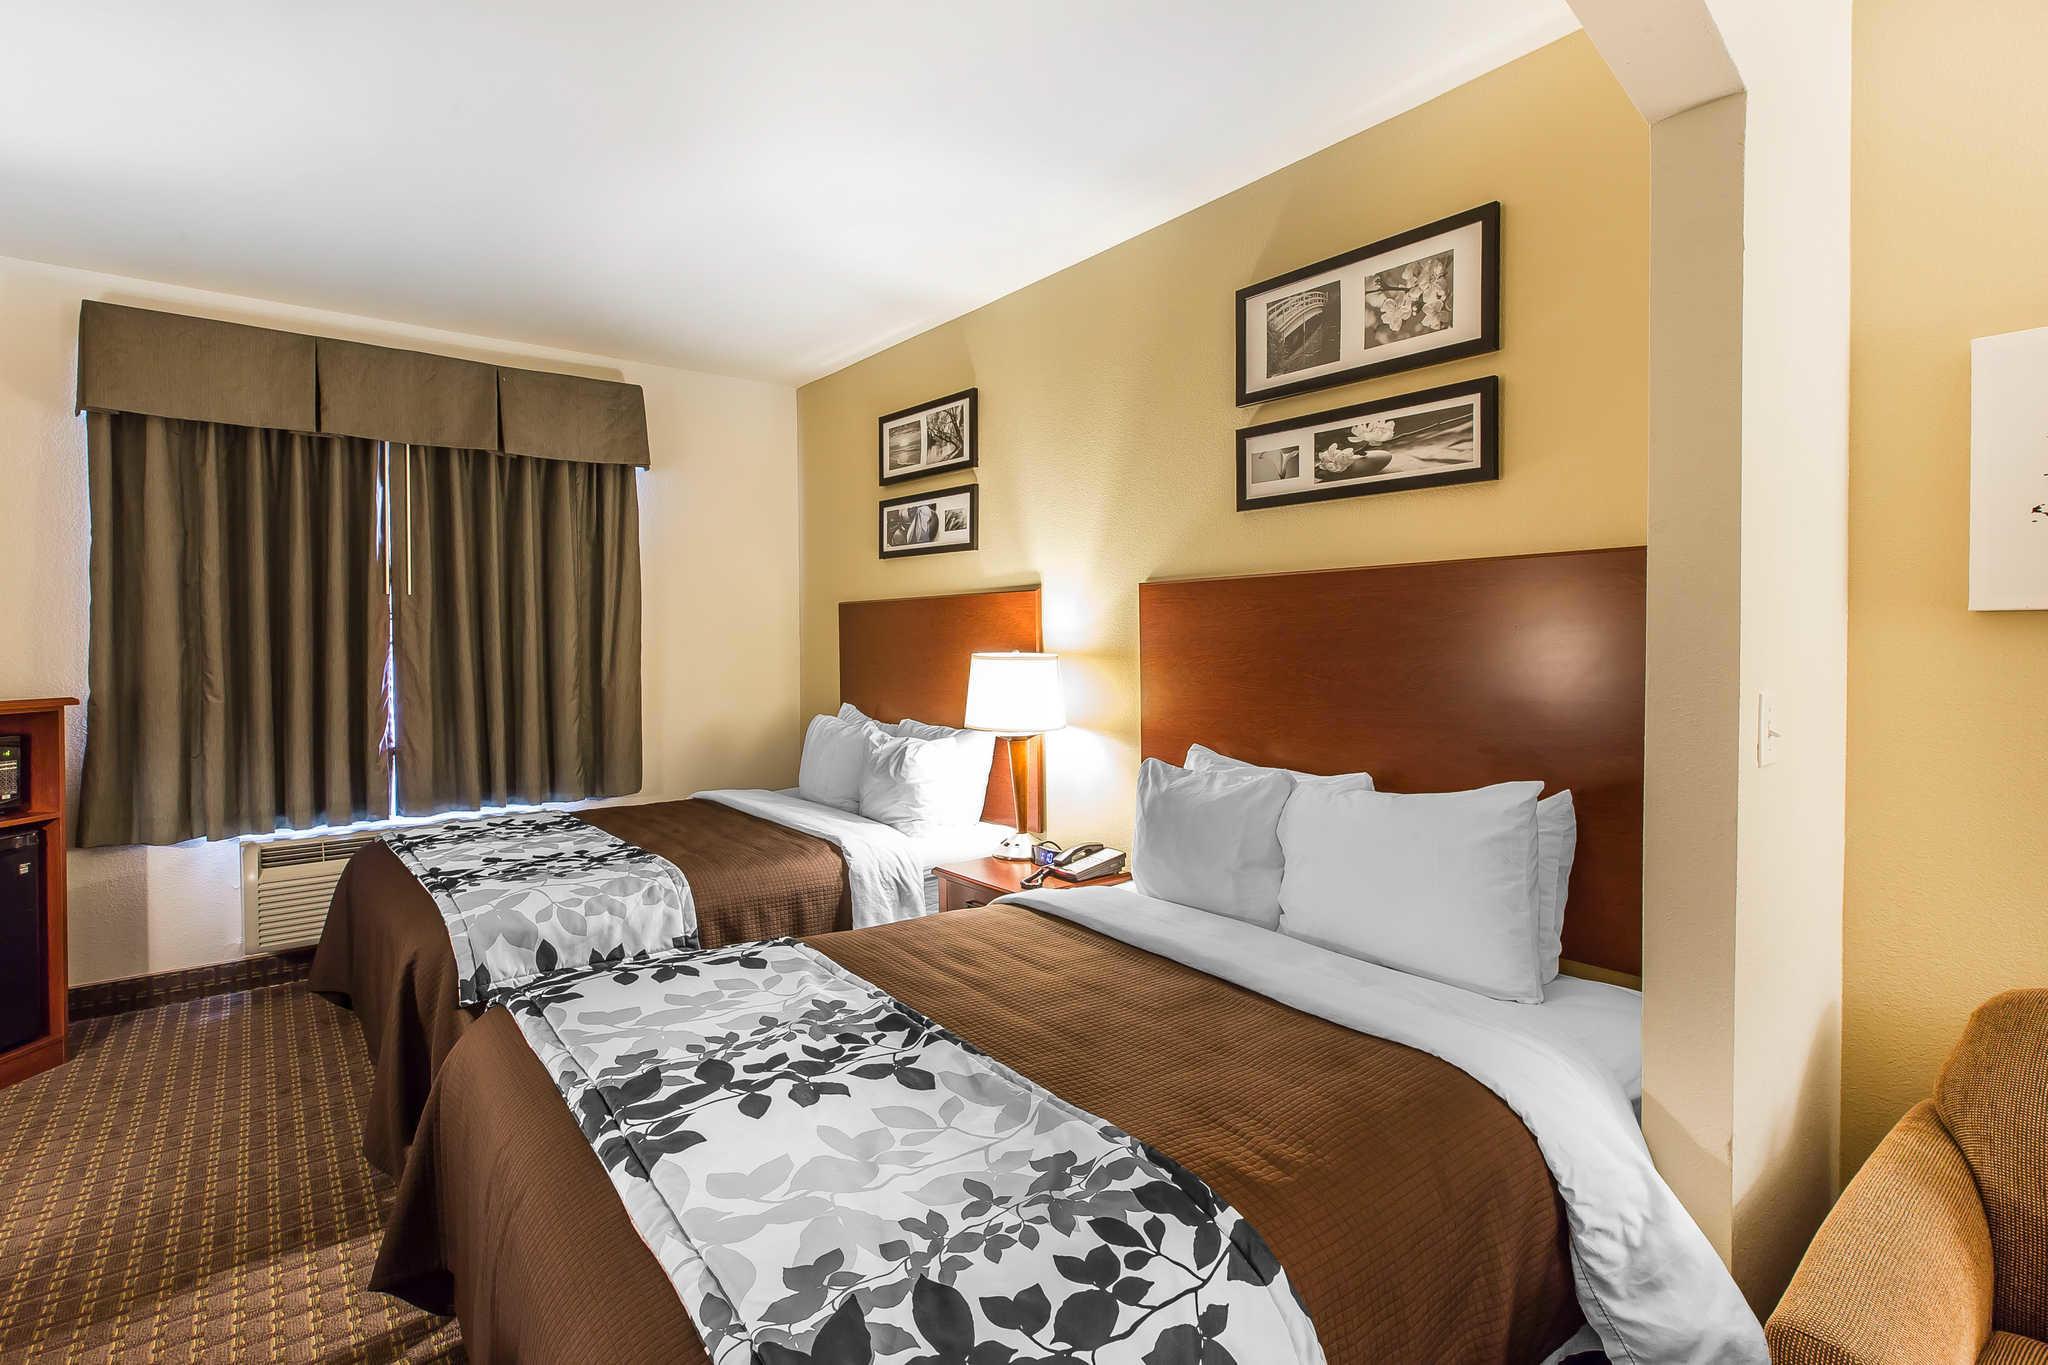 Sleep Inn & Suites At Kennesaw State University image 23